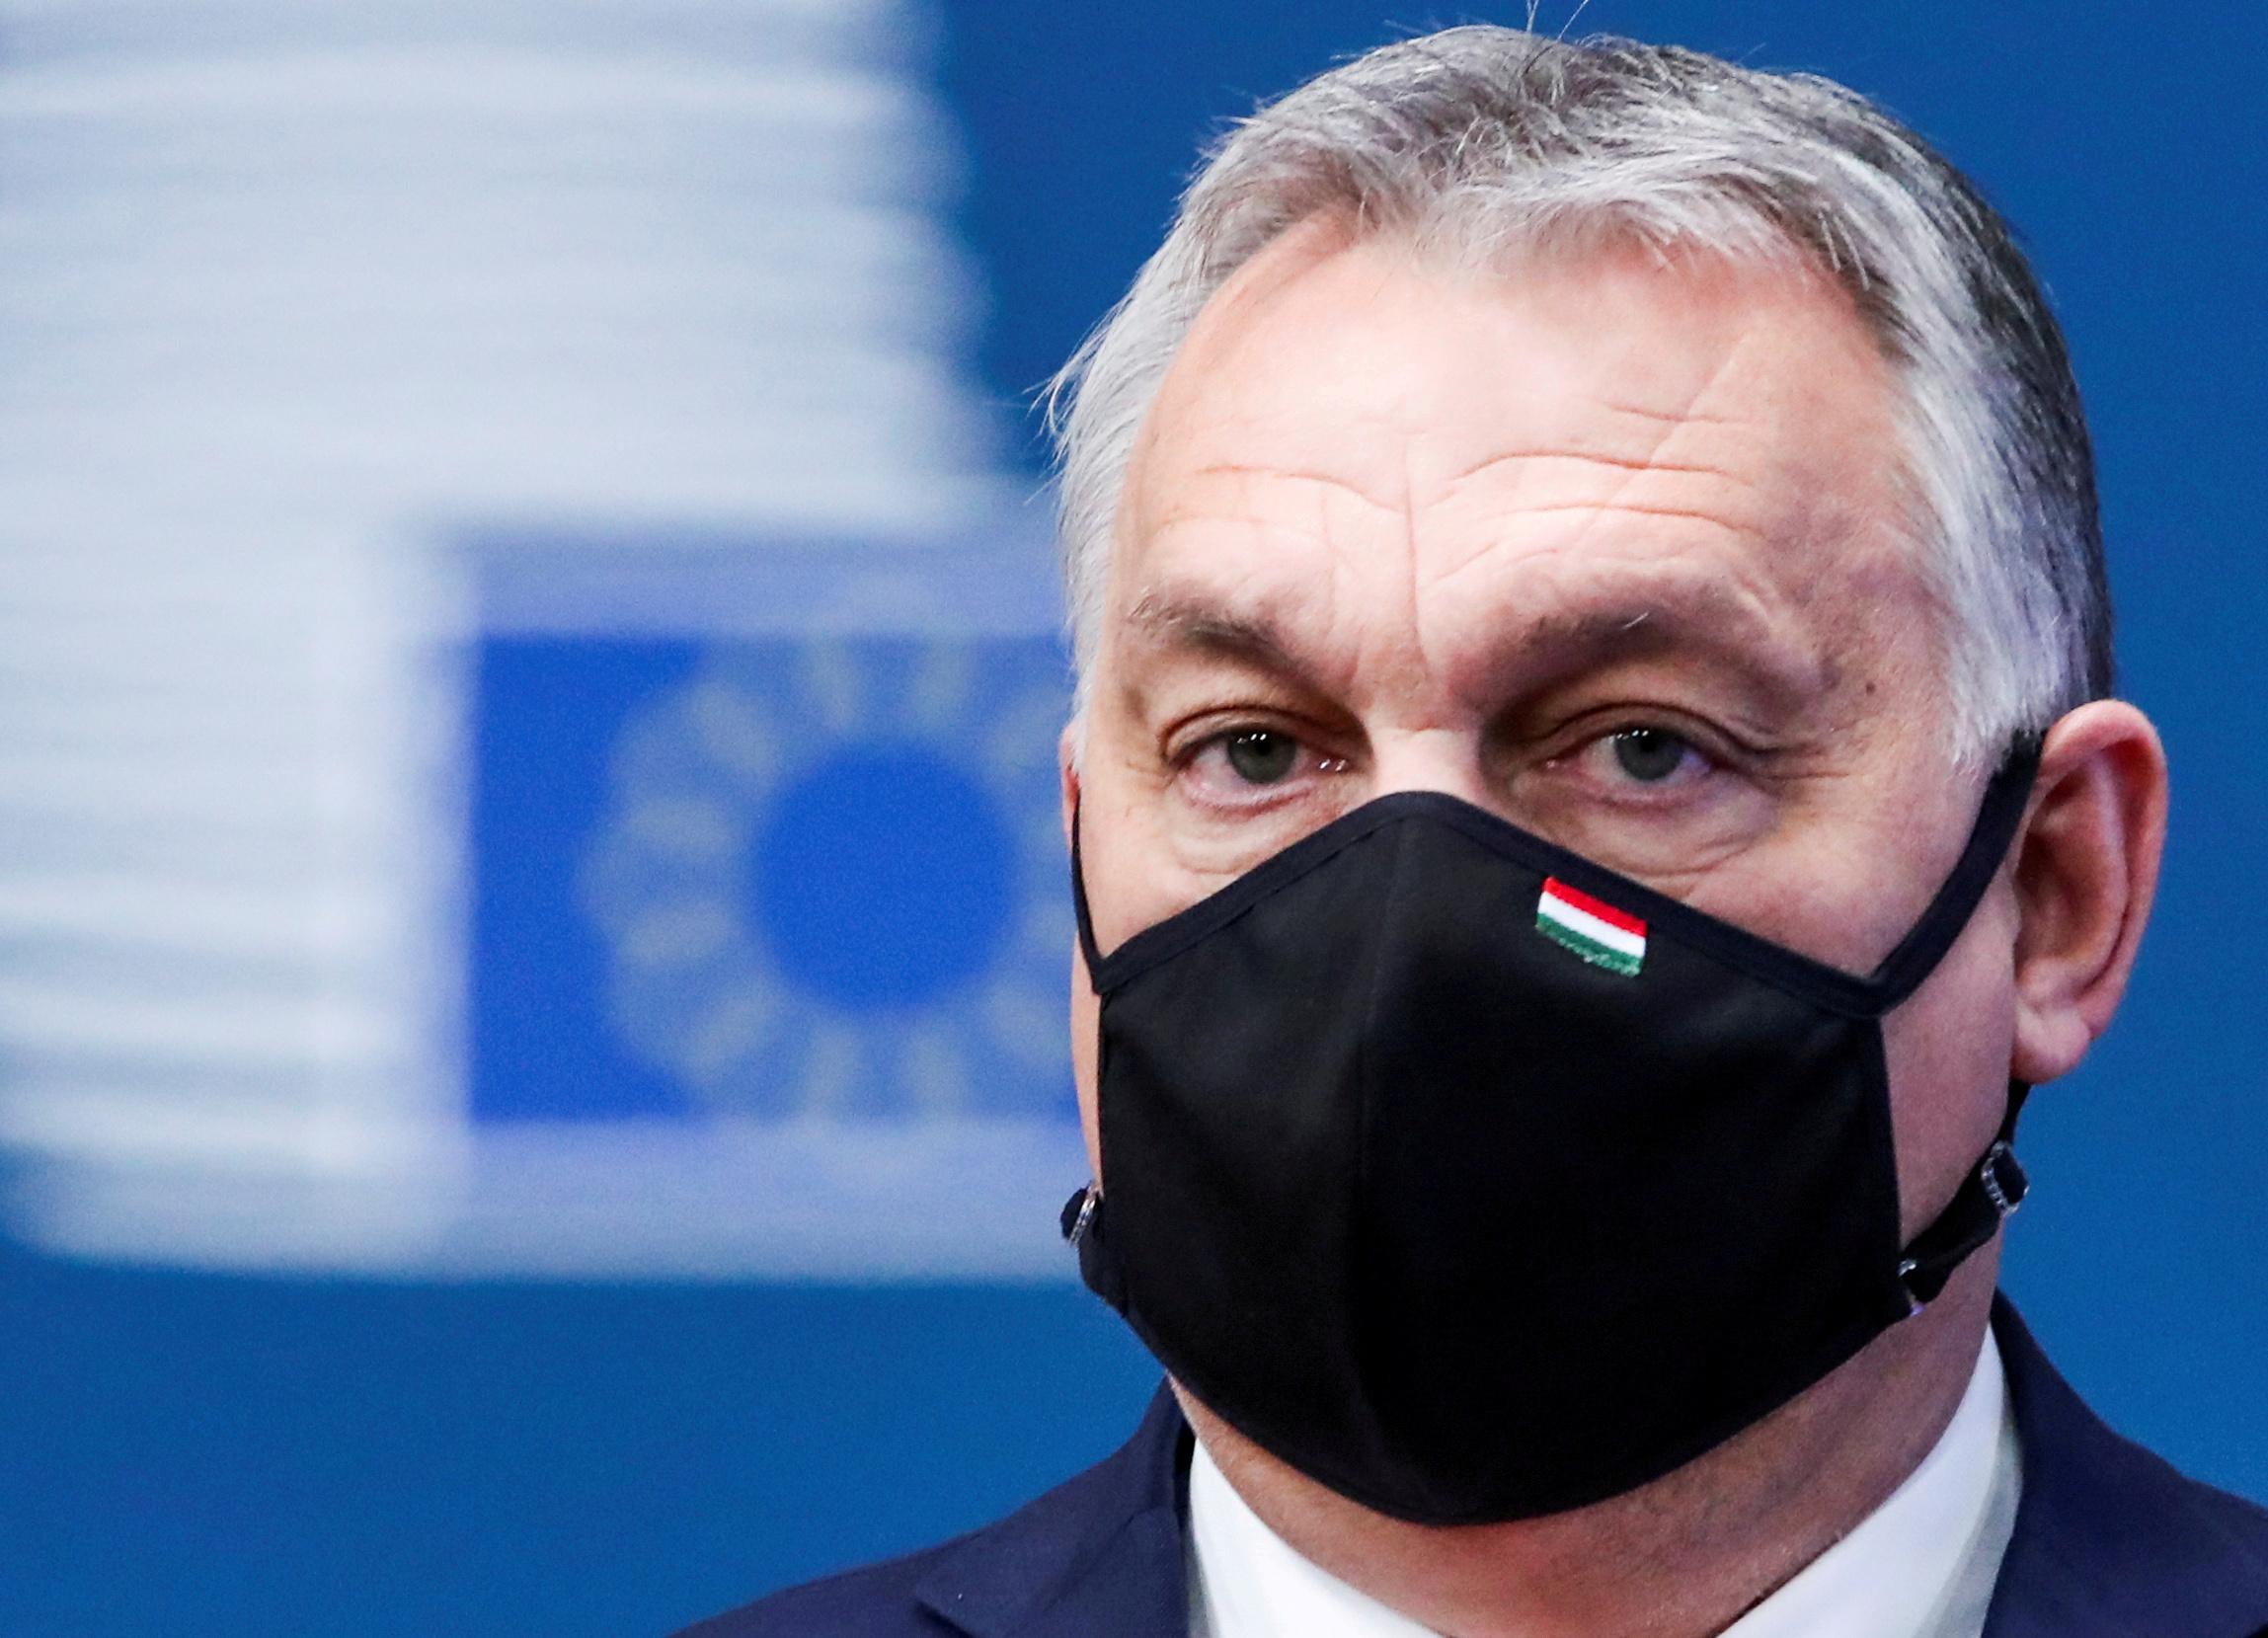 Hungary's Prime Minister Viktor Orban arrives for an EU summit amid the coronavirus disease (COVID-19) lockdown in Brussels, Belgium December 10, 2020. REUTERS/Yves Herman/Pool